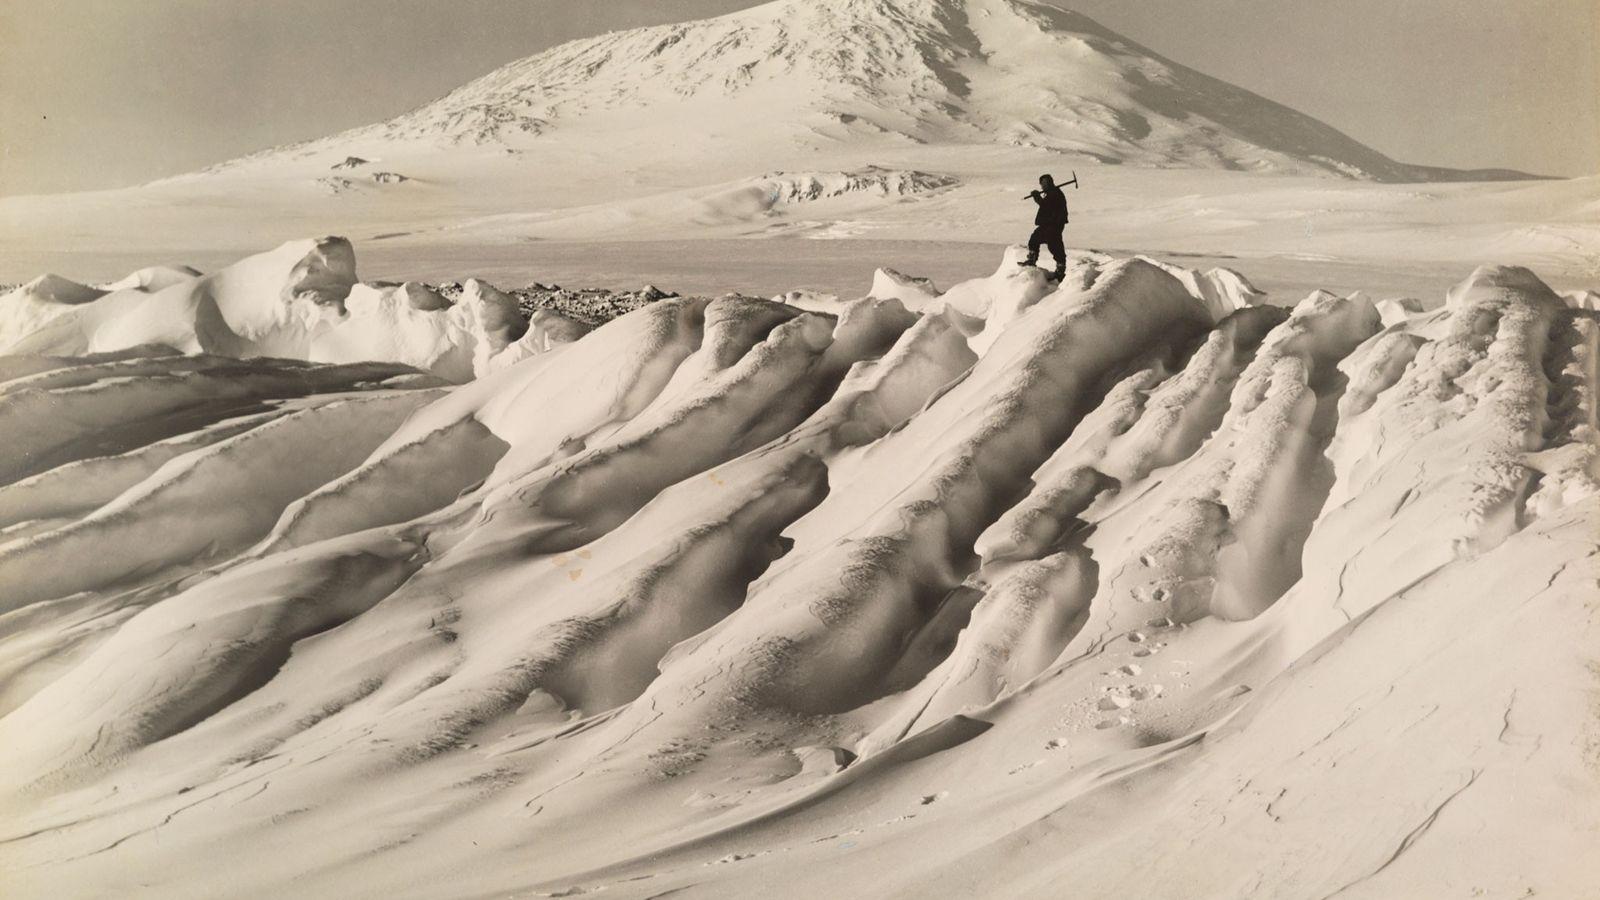 Expedición al Polo Sur